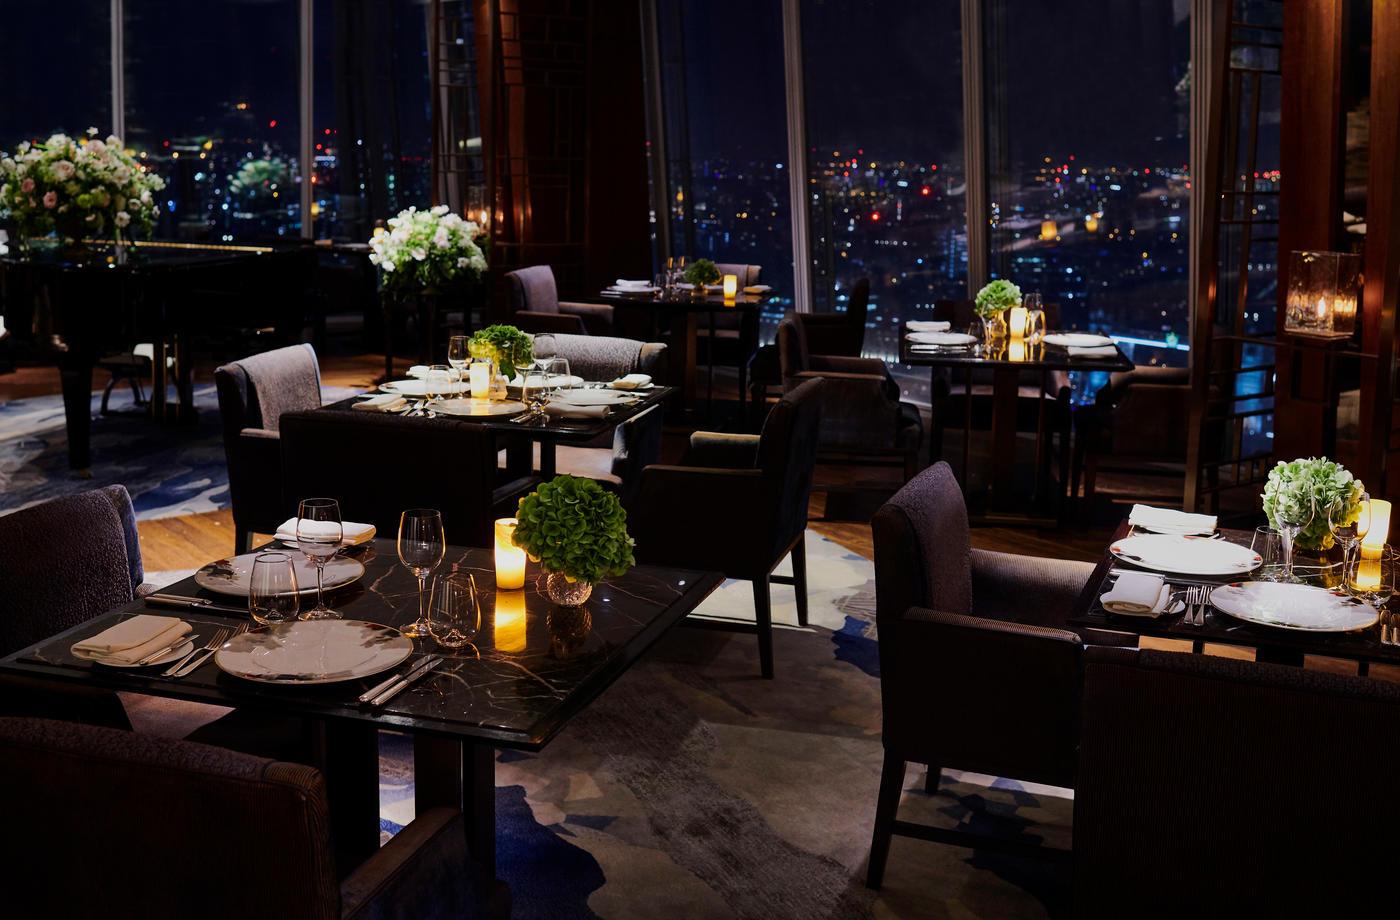 255-shangri-la-hotel-at-the-shard-london-ting-restaurant-night-empty.jpg